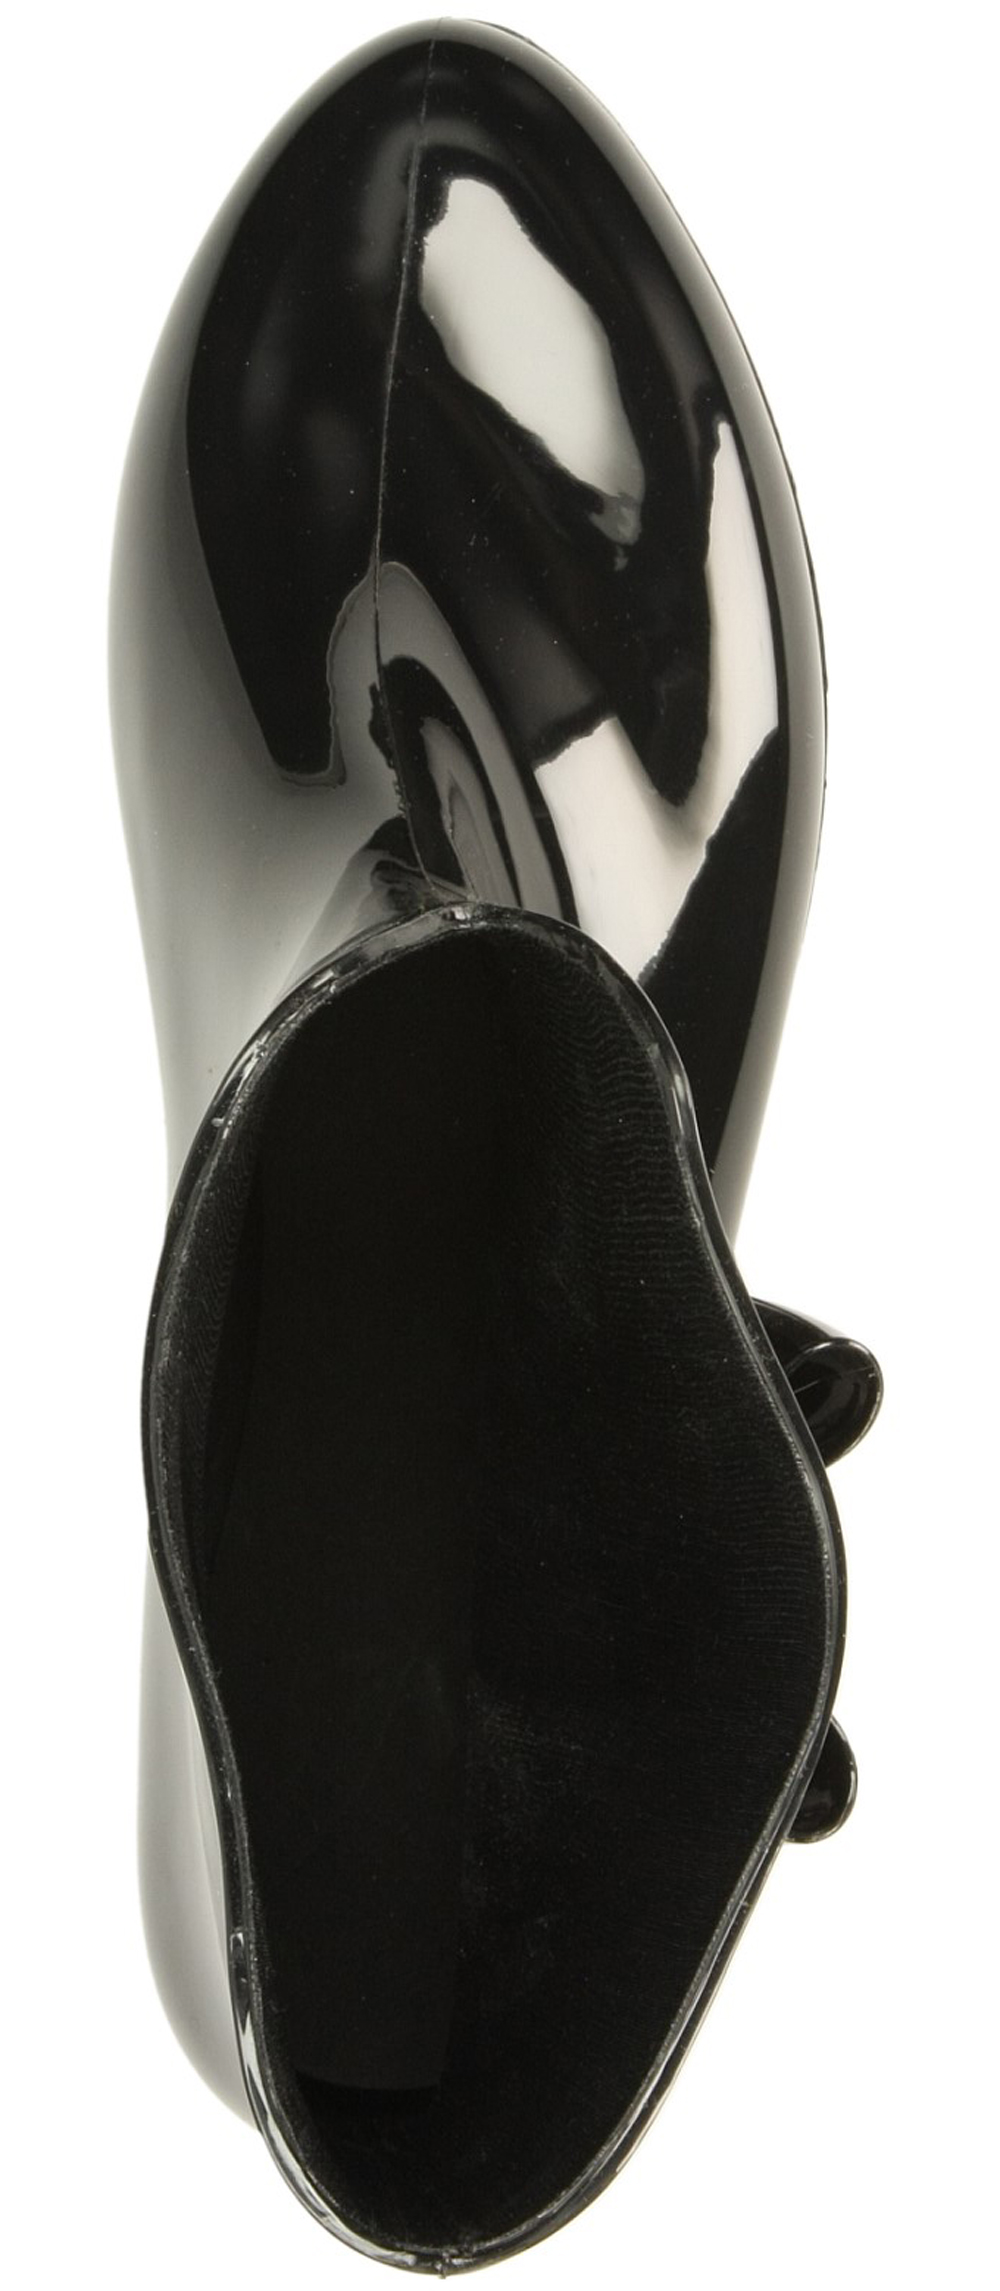 MELISKI CASU 805 kolor czarny